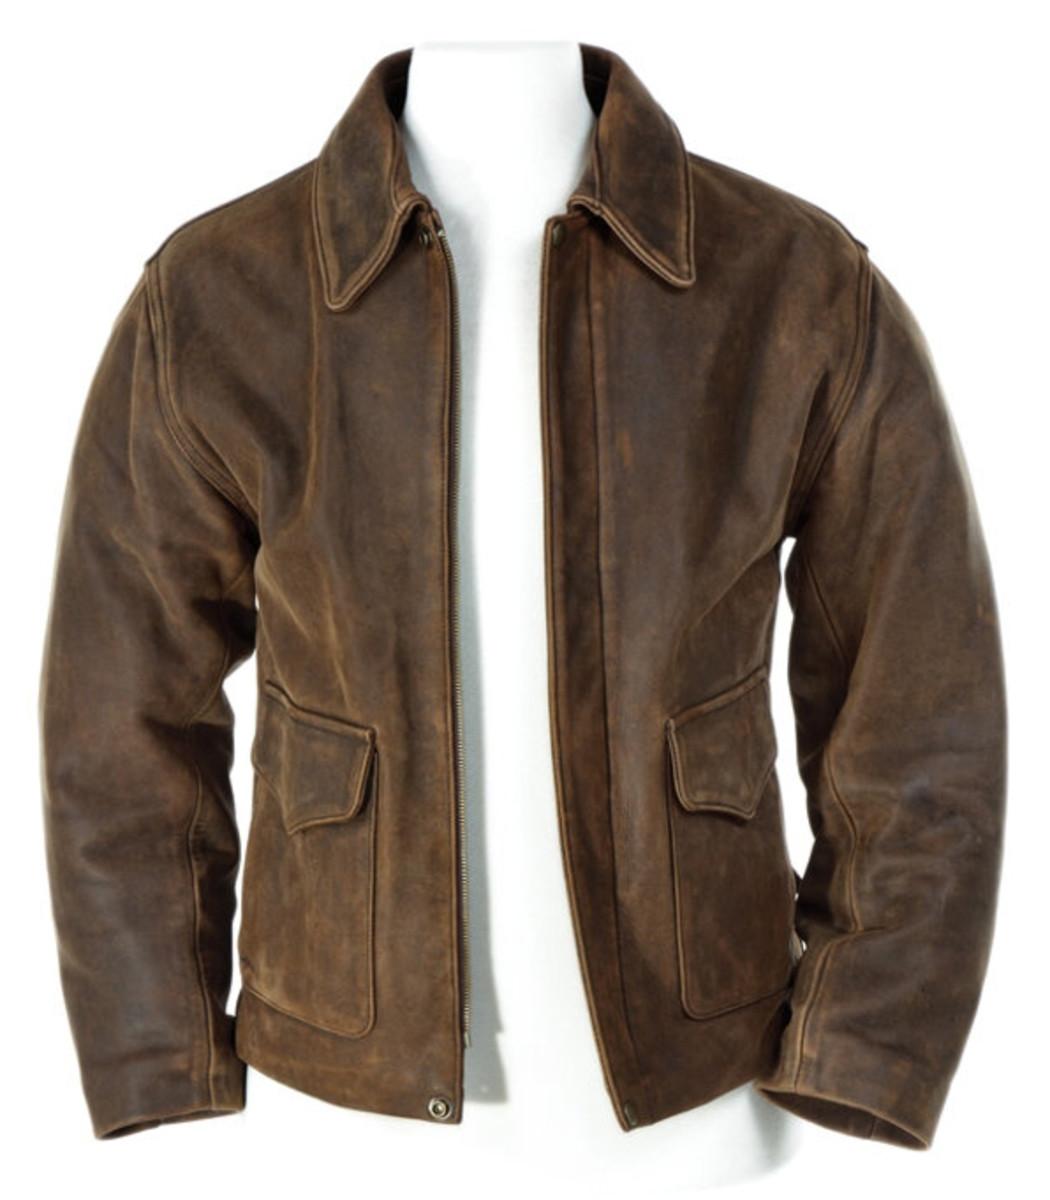 Indiana Jones' leather jacket